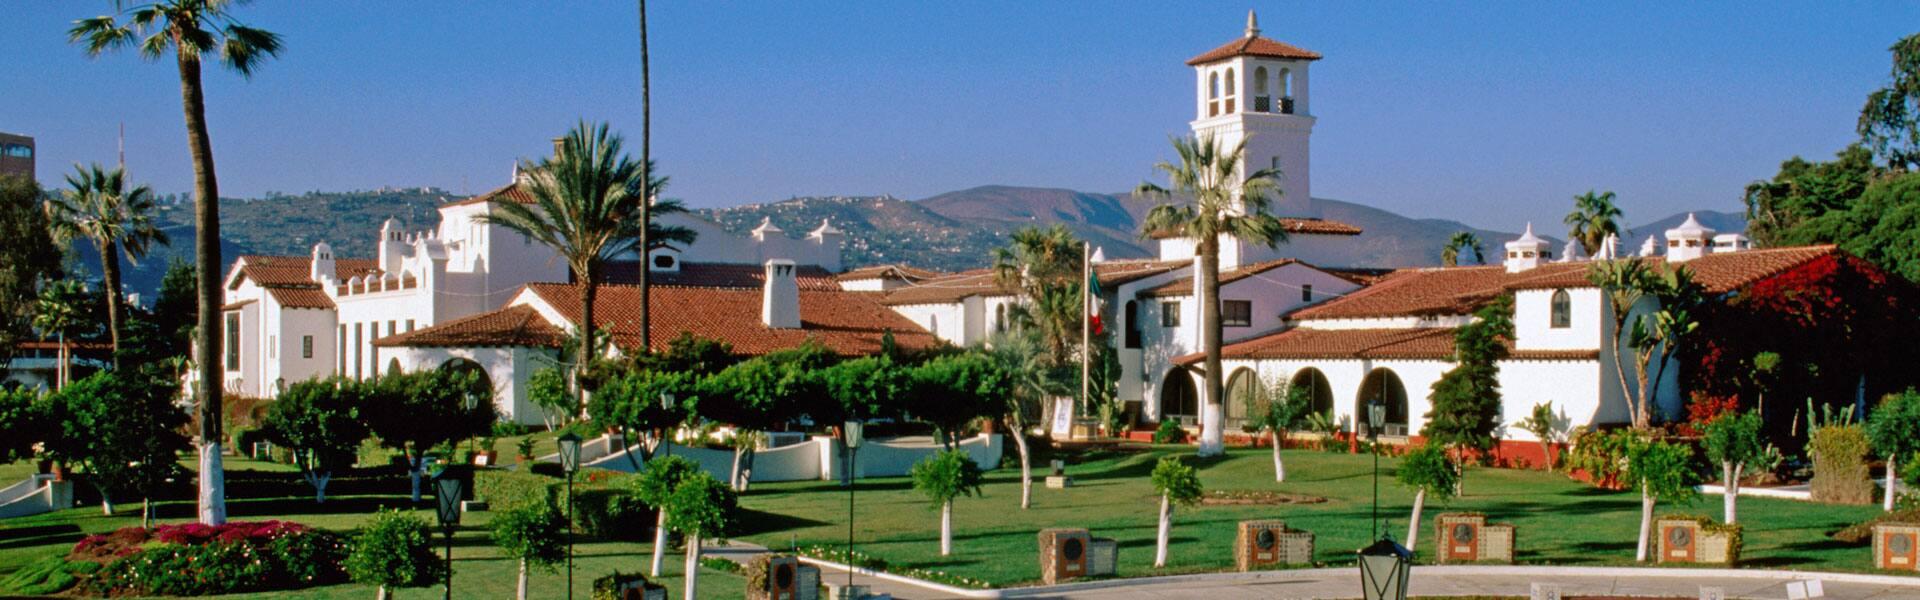 Pacific Coast: San Francisco & San Diego